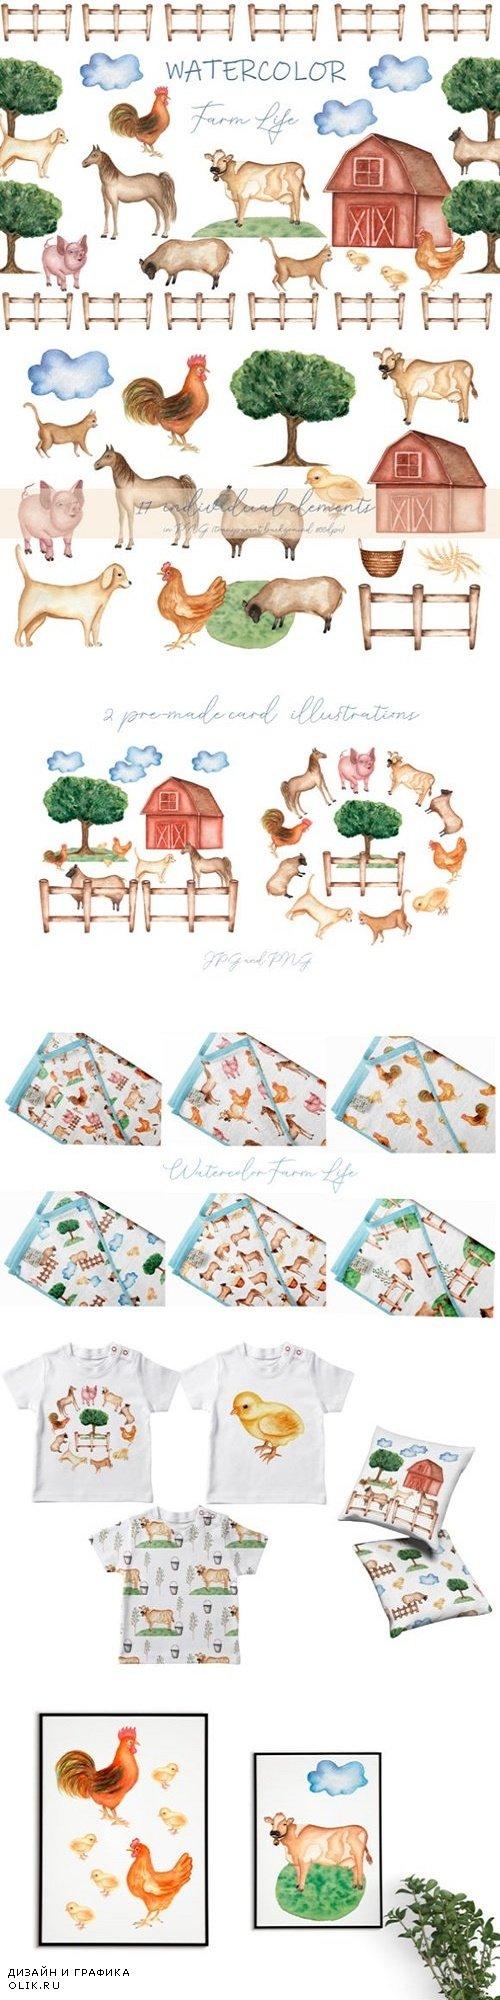 Watercolor Farm life - 3699387